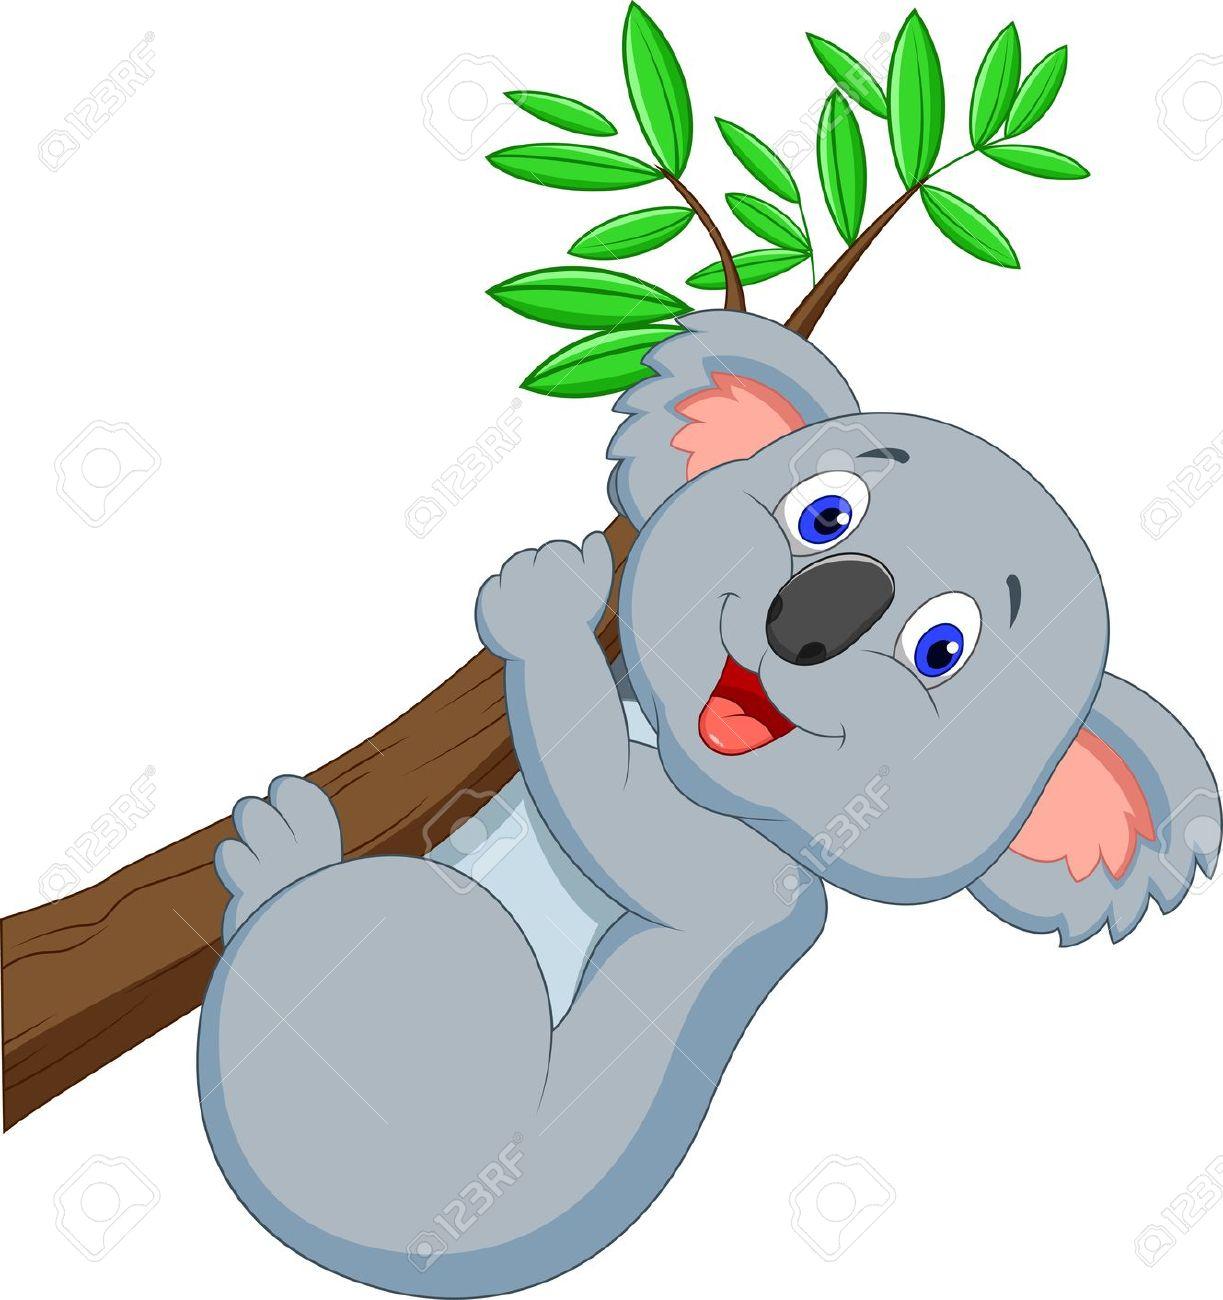 Koala Bear clipart #7, Download drawings